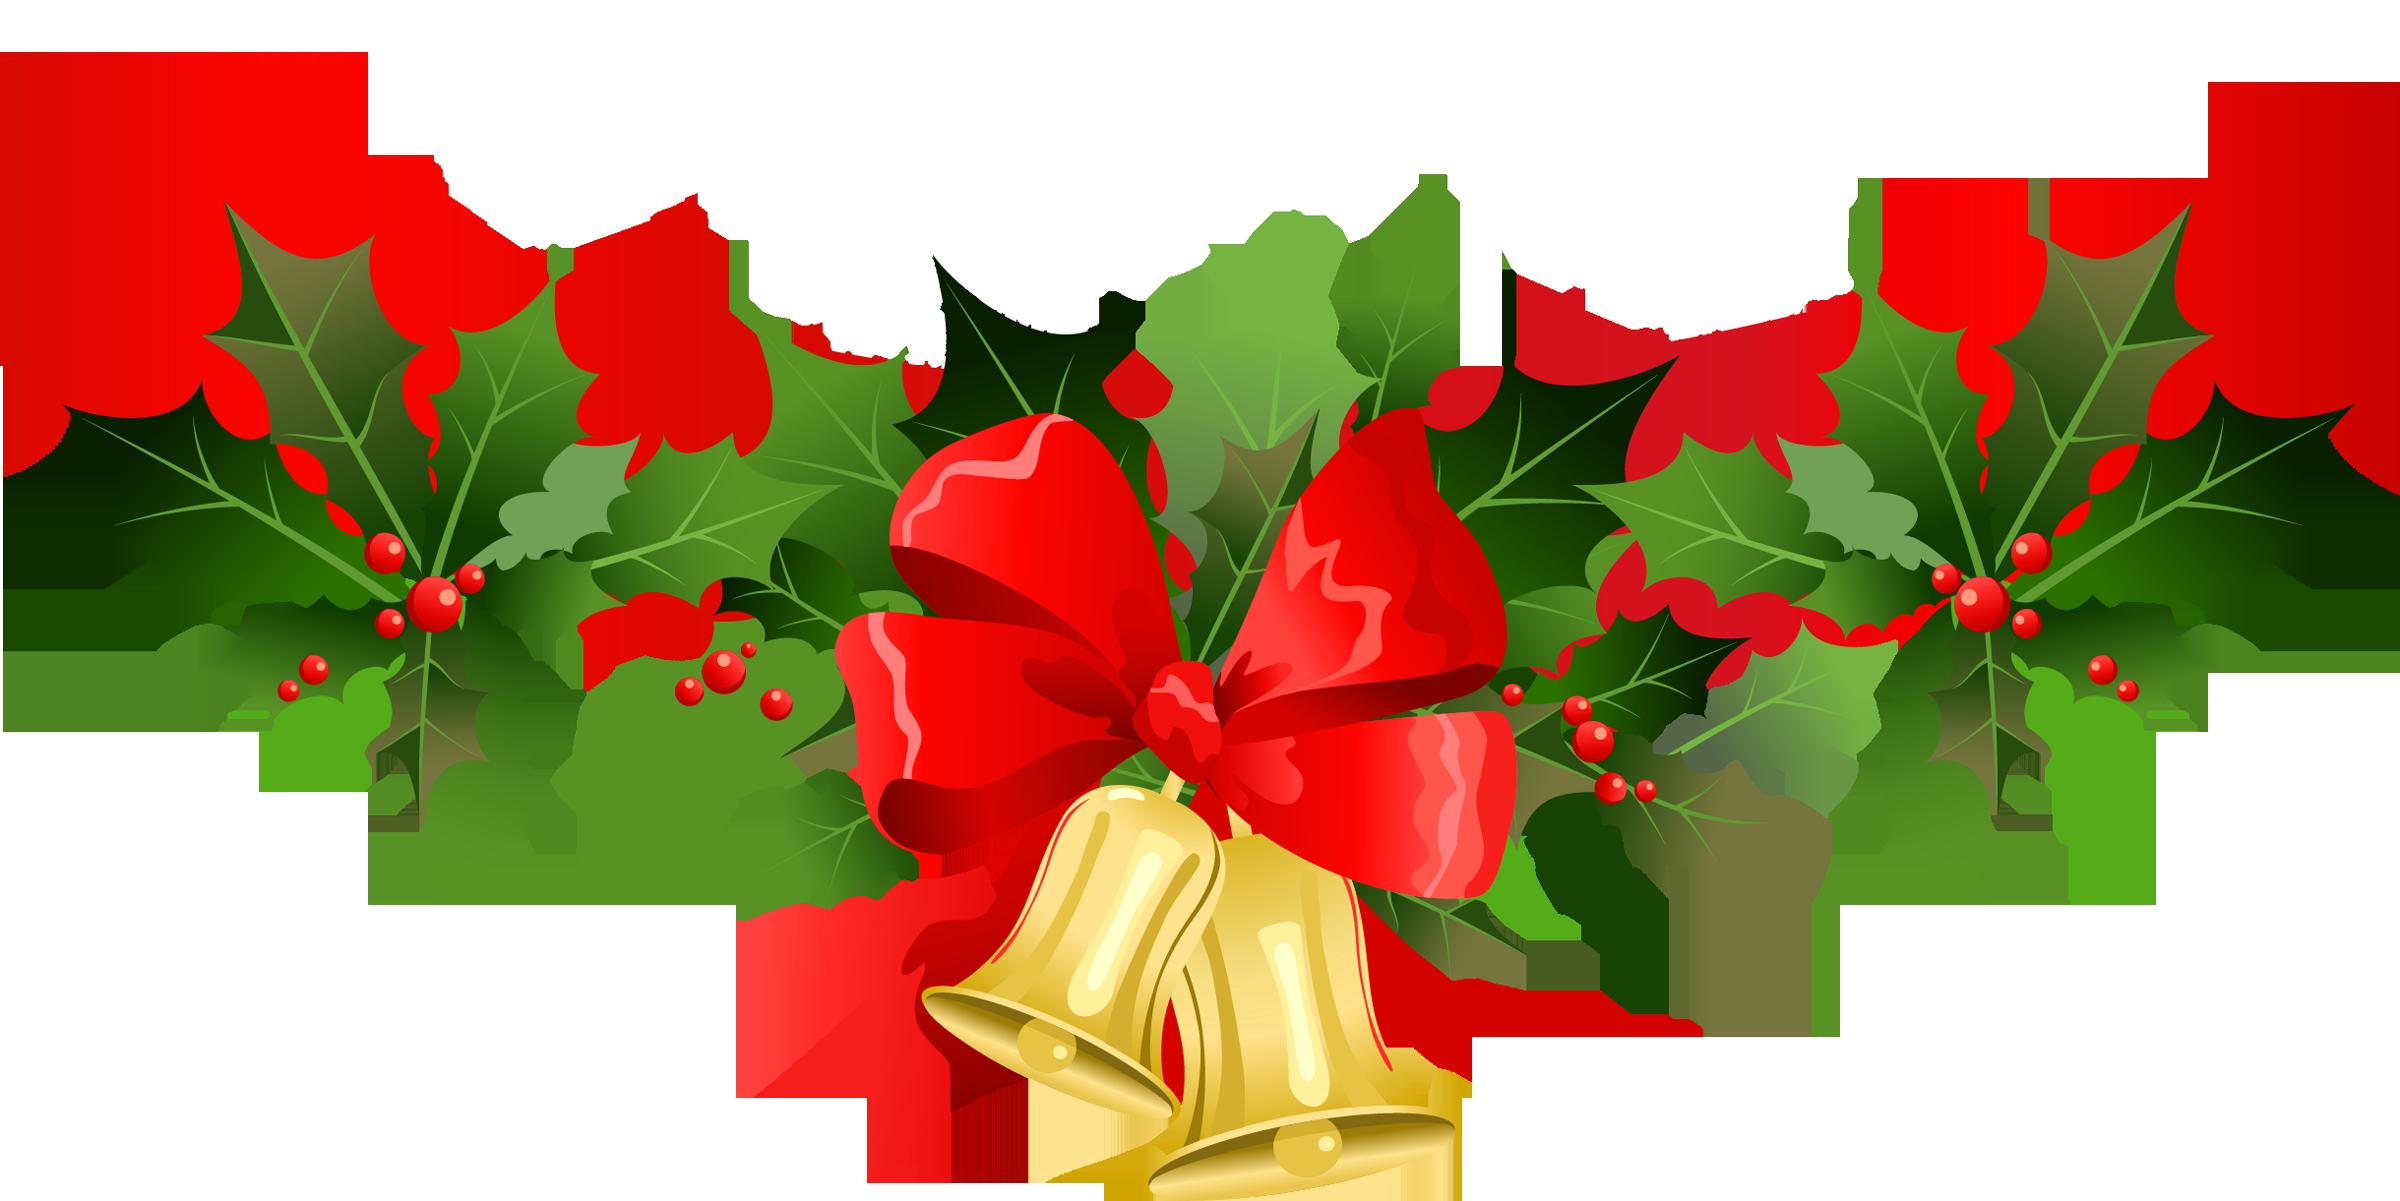 Christmas Clip Art Banners Clipart Best-Christmas Clip Art Banners Clipart Best-6